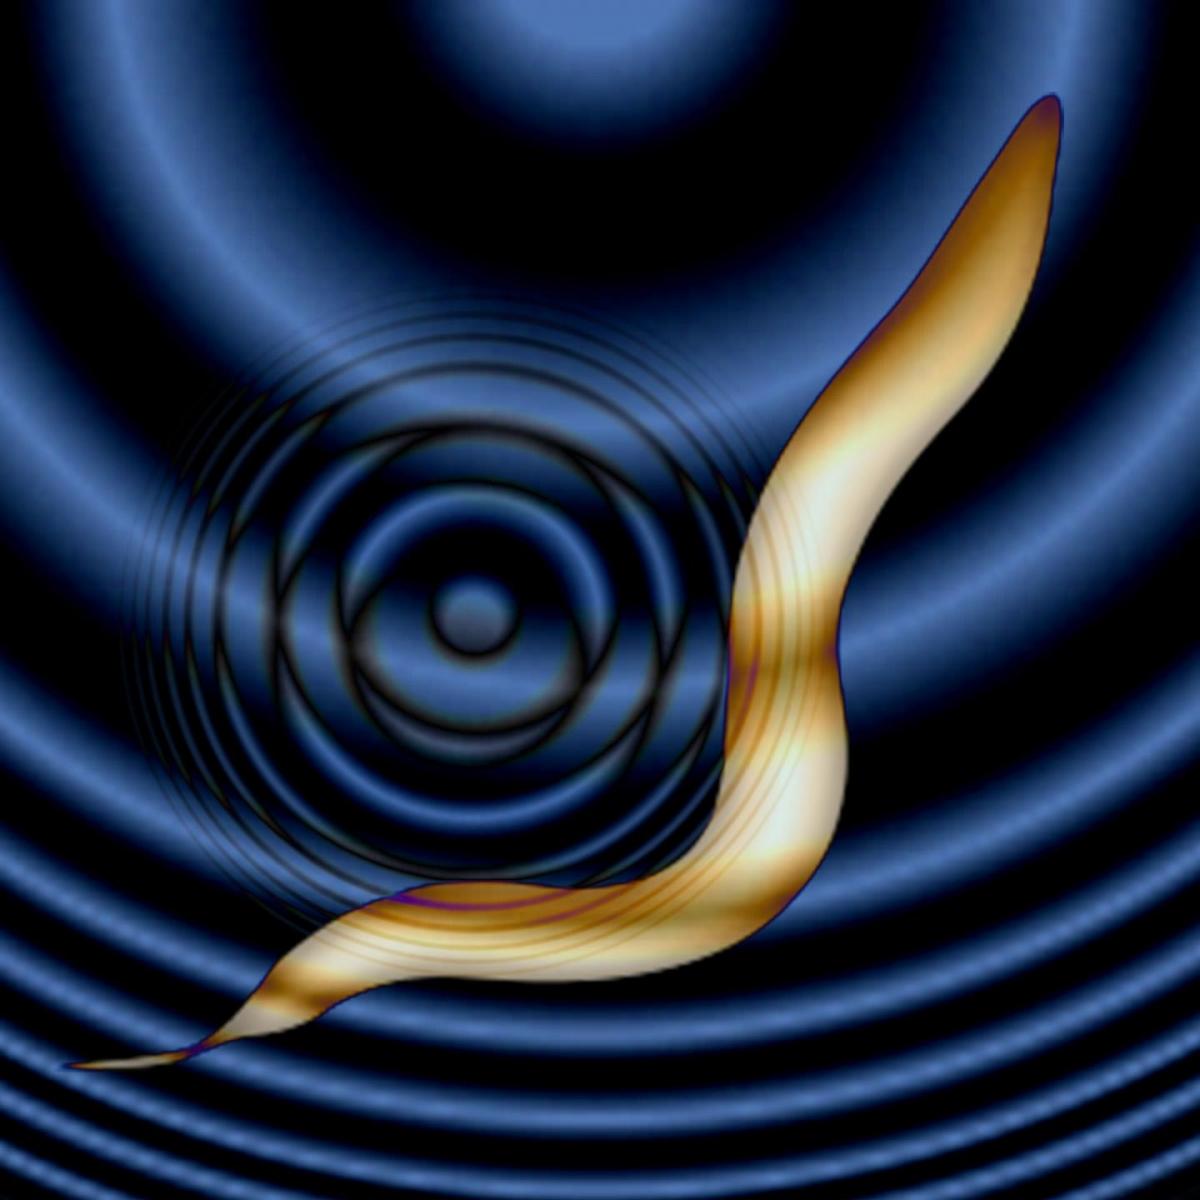 worm brains controlled sound waves